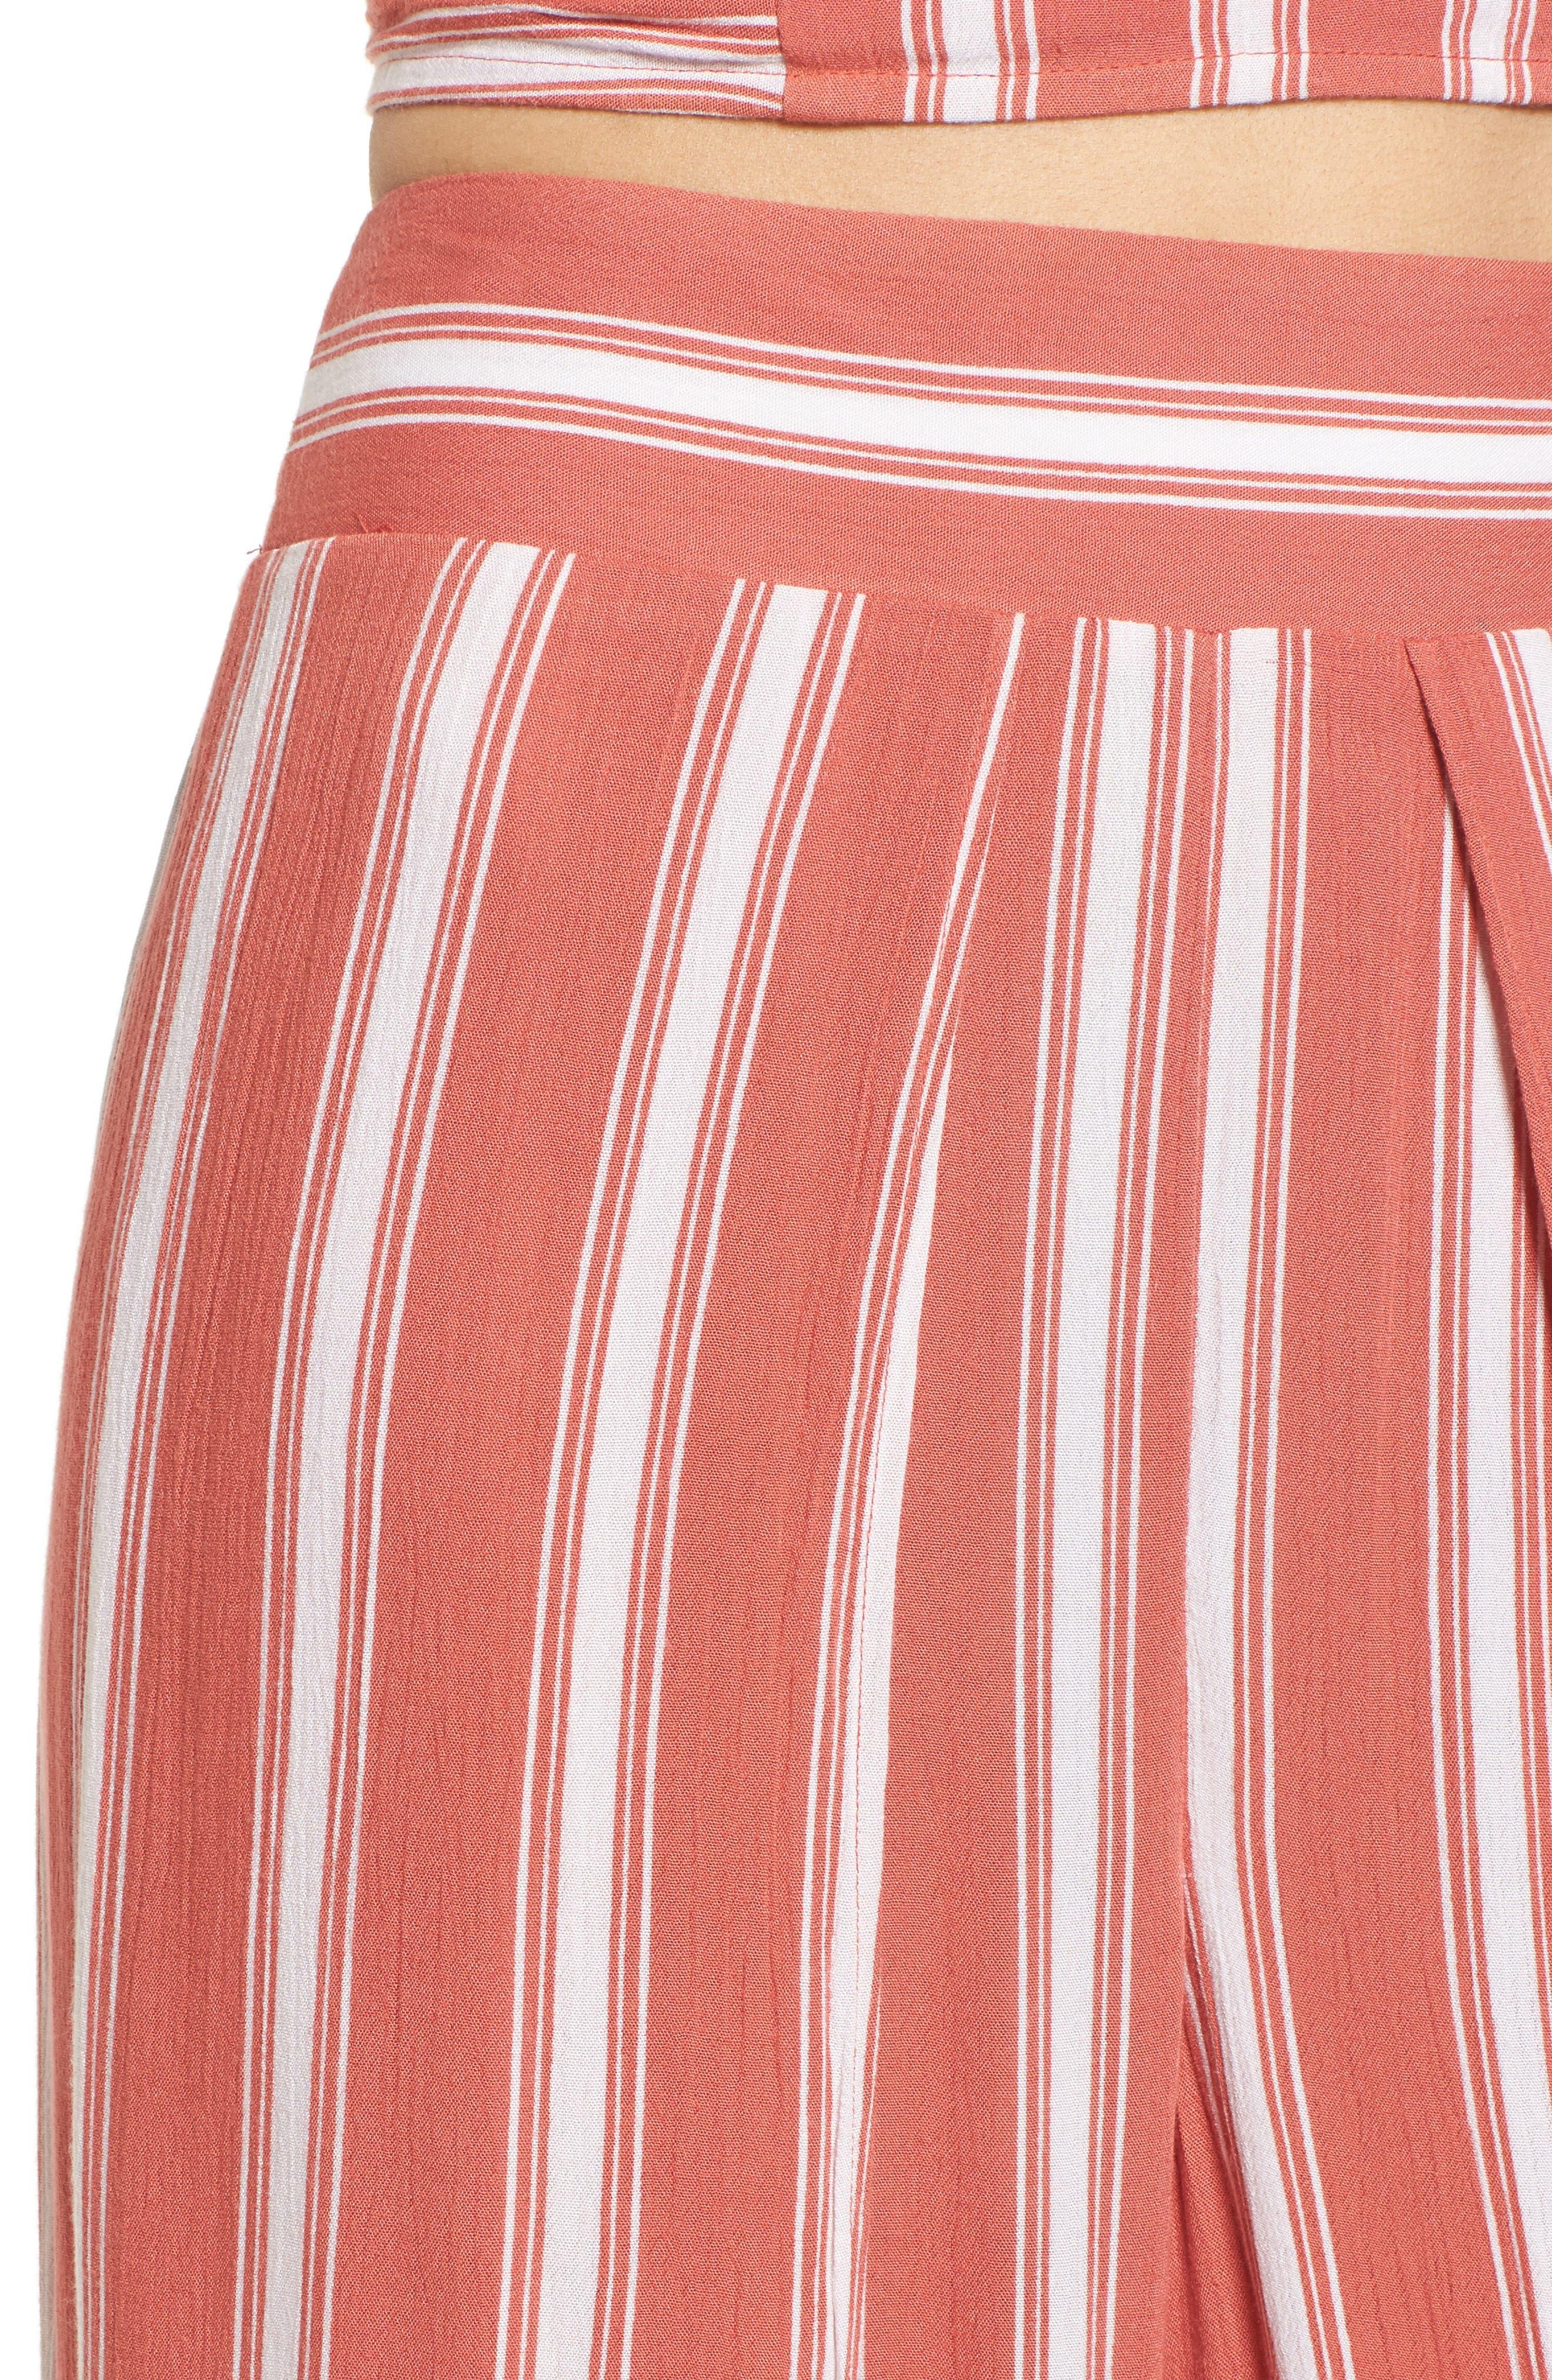 Stripe Split Leg Walkthrough Pants,                             Alternate thumbnail 4, color,                             950